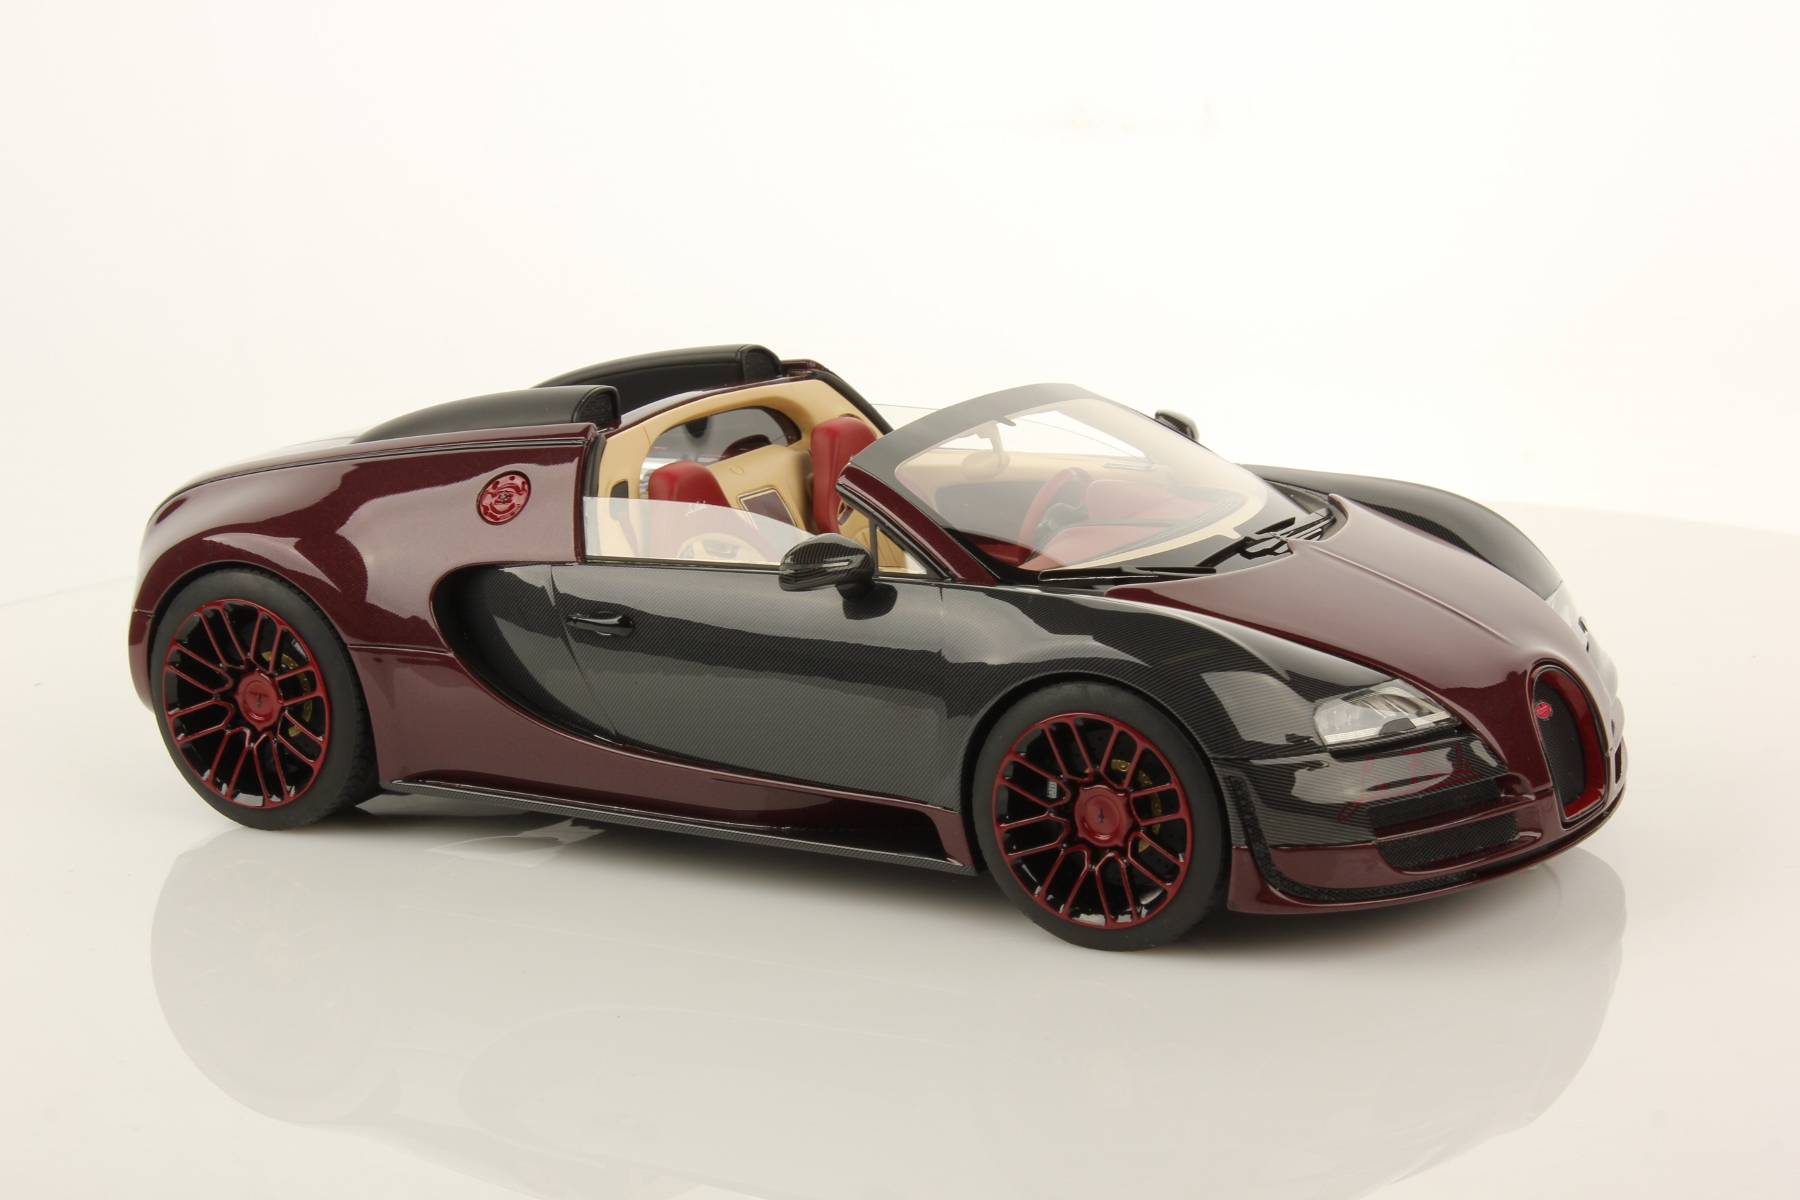 IMG_7162-1800x1200 Interesting Bugatti Veyron Grand Sport Vitesse Vs Pagani Huayra Cars Trend